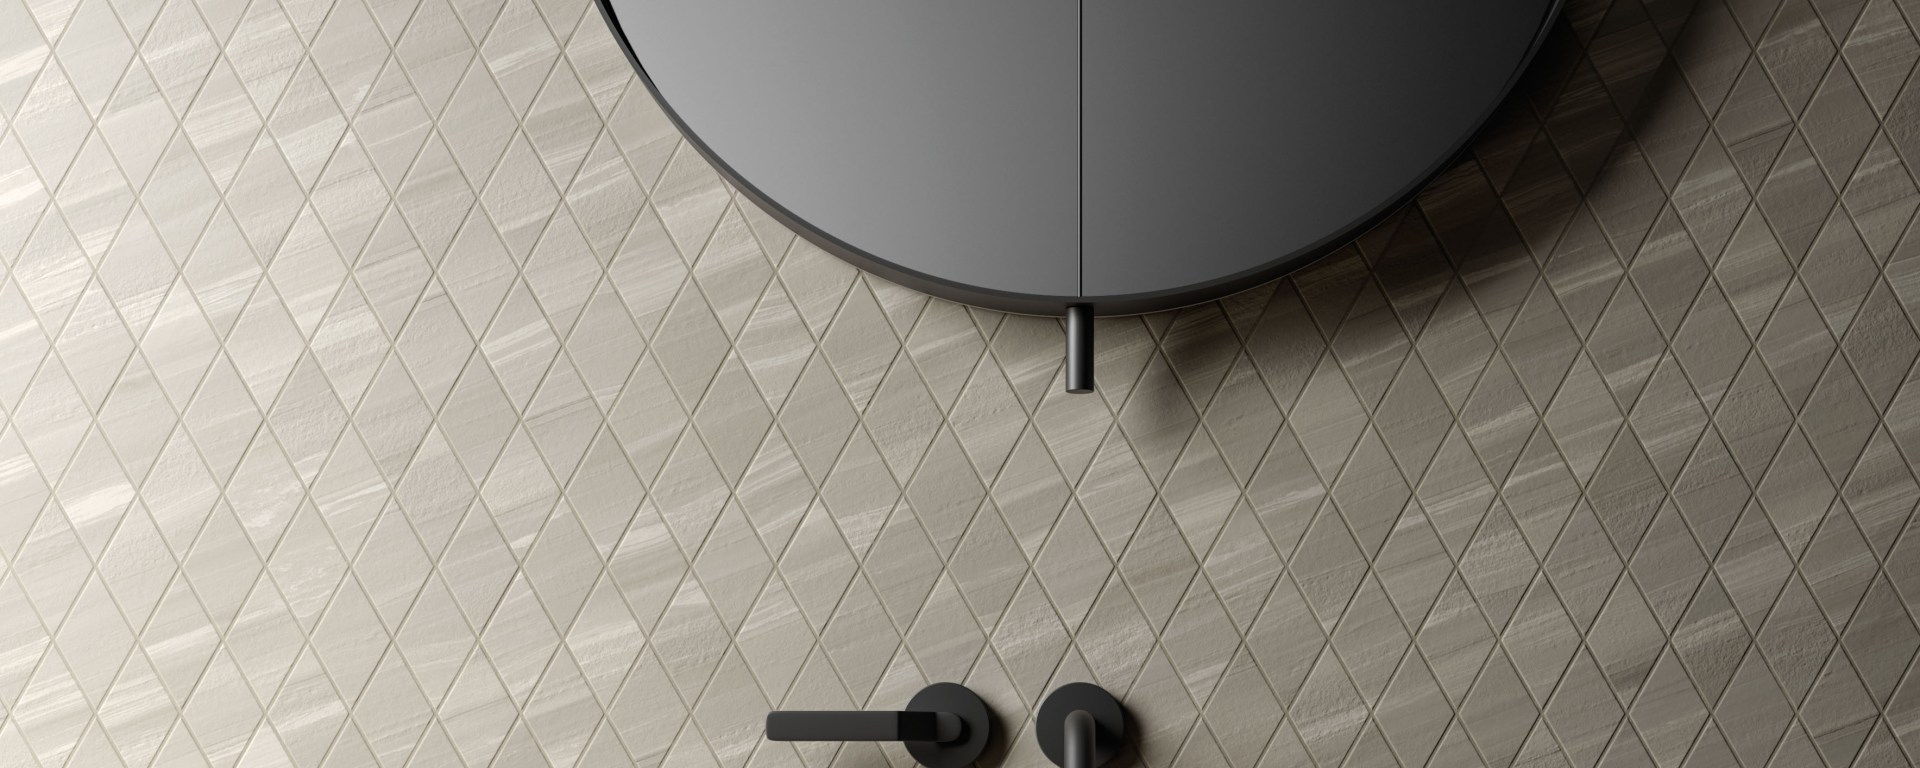 ItalGraniti Hematite Coverings new tile collection